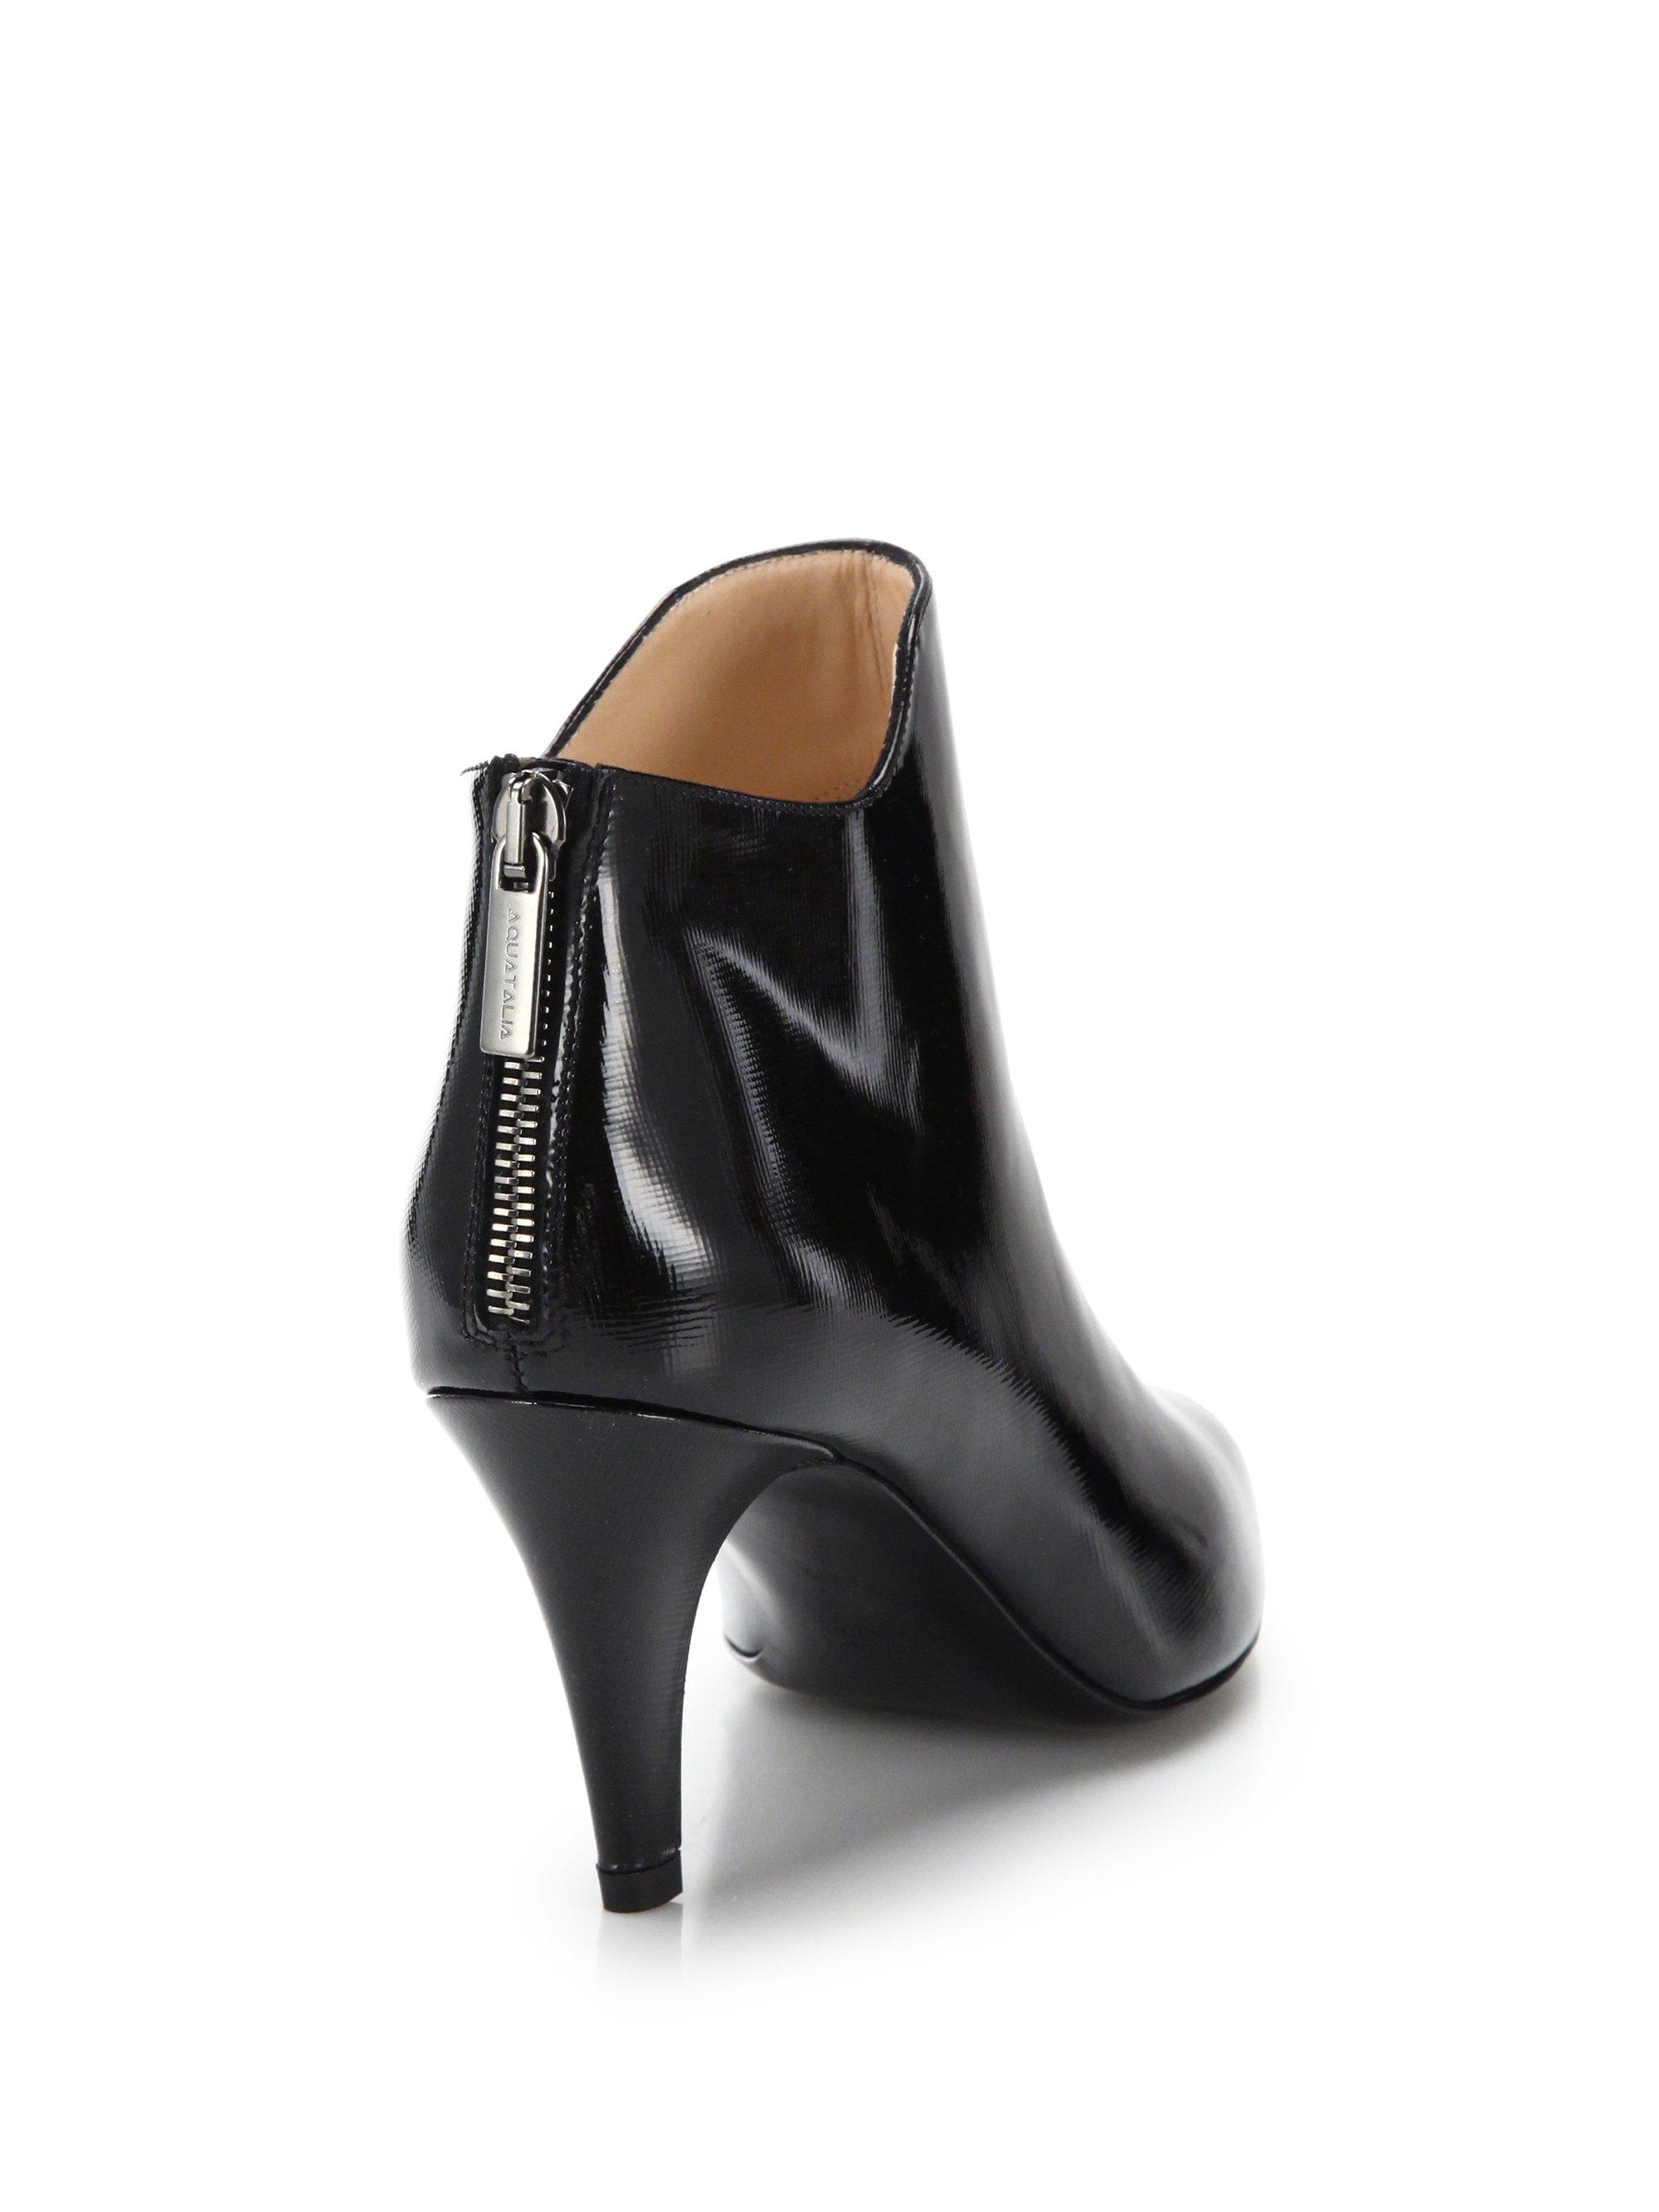 Aquatalia Sala Patent Leather Booties In Black Lyst